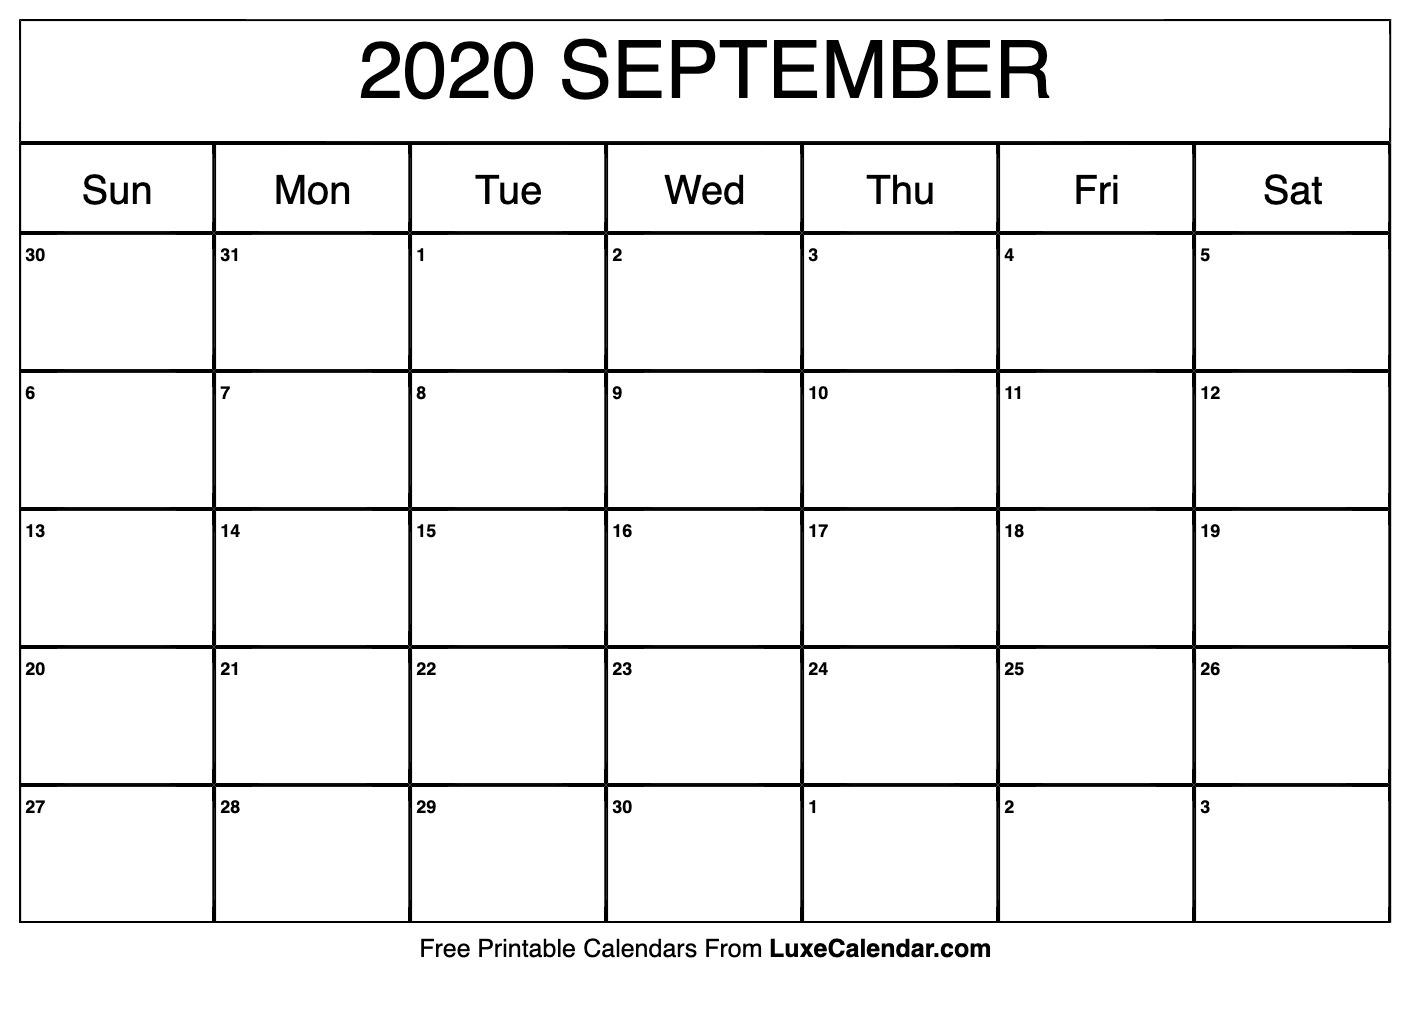 Blank September 2020 Calendar Printable - Luxe Calendar_Blank Calendar September 2020 Pdf